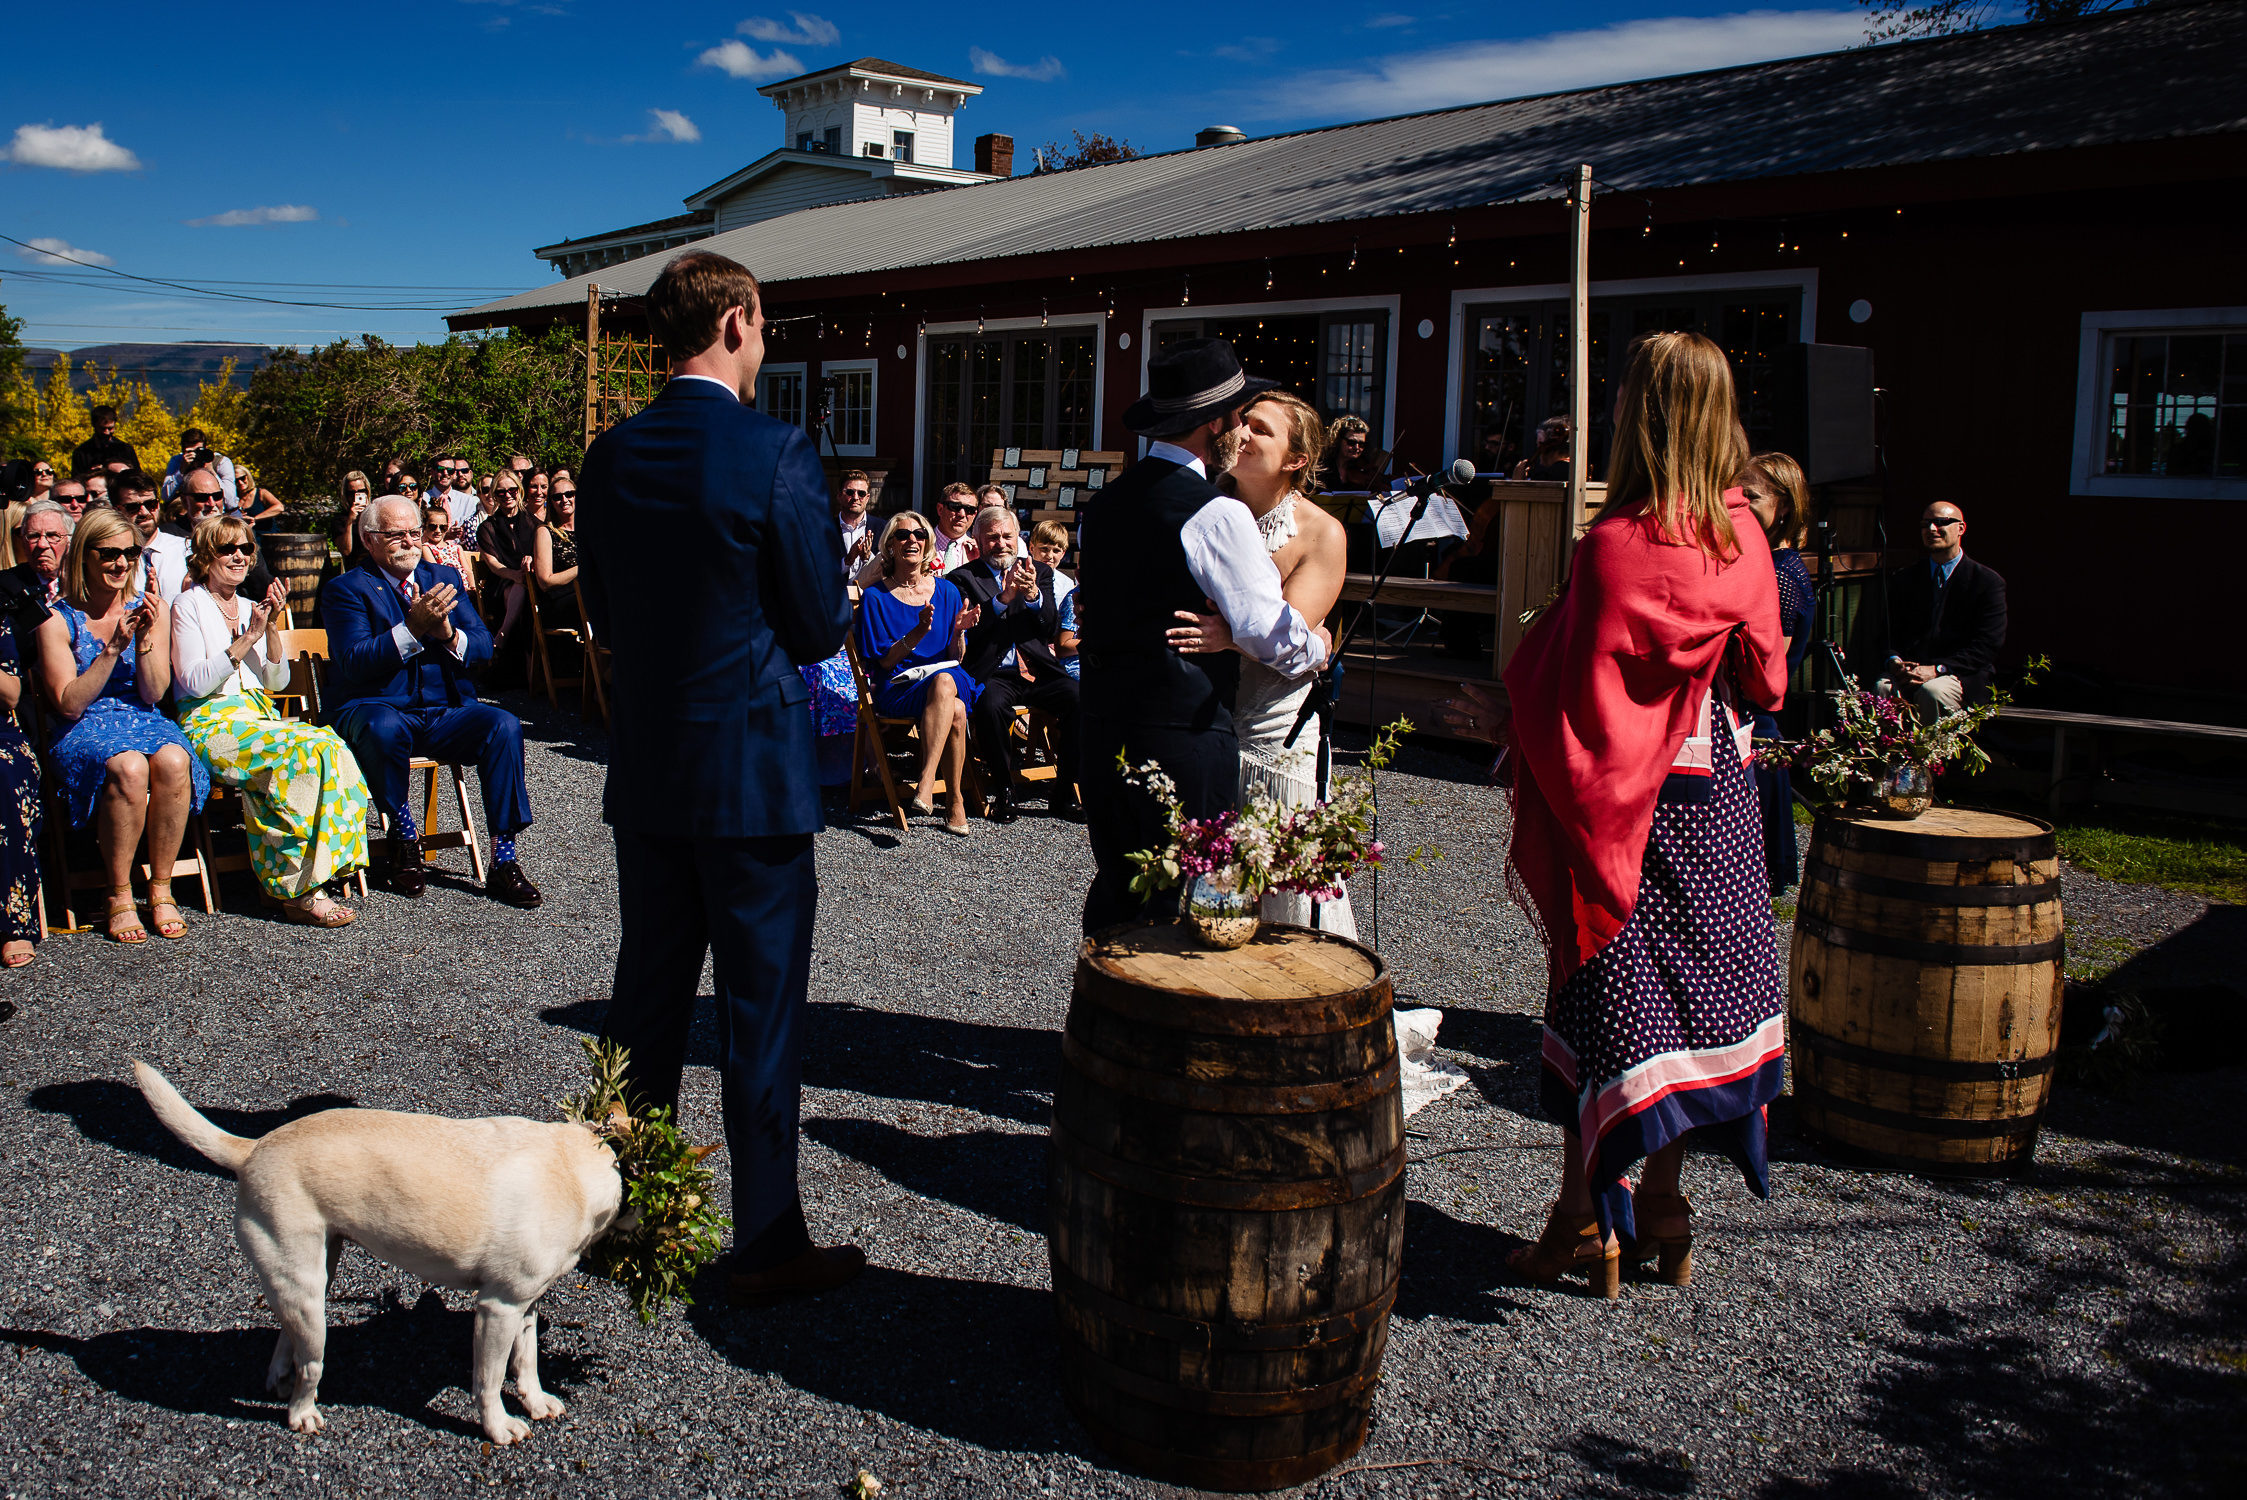 tourterelle-vermont-wedding-photographers-019-2-2247x1500.jpg